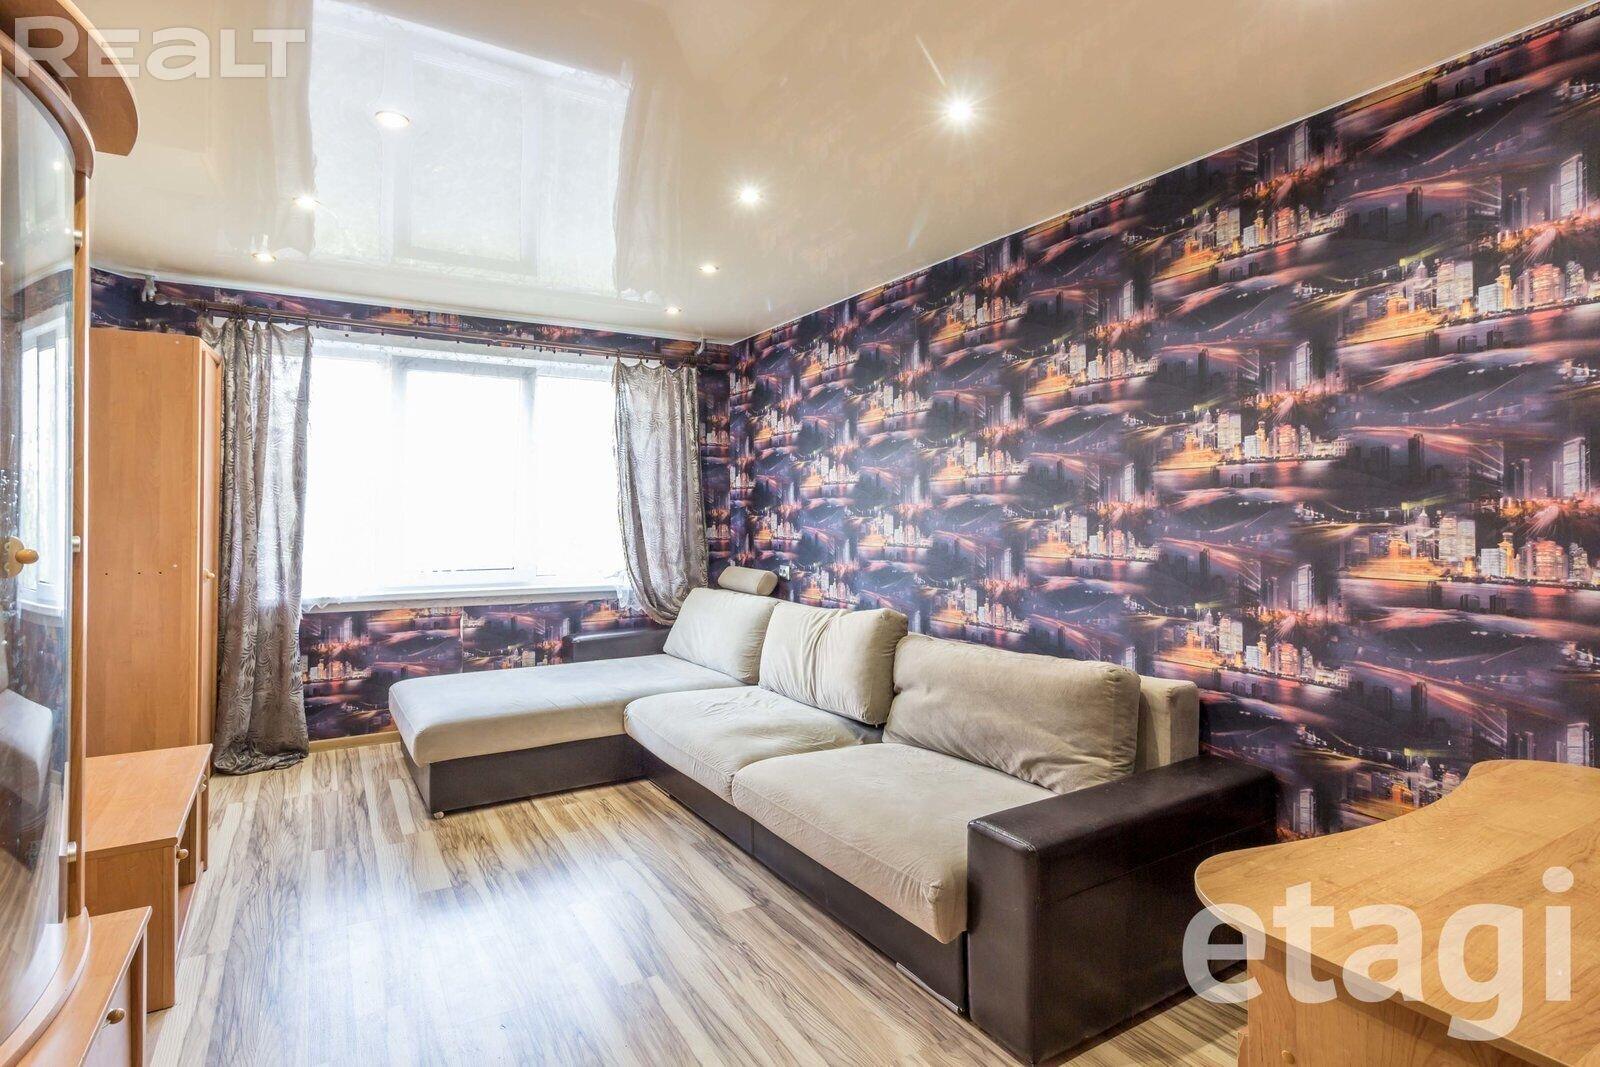 Продажа 3-х комнатной квартиры в г. Минске, ул. Шишкина, дом 26 (р-н Р-н ДК МАЗ). Цена 181 696 руб